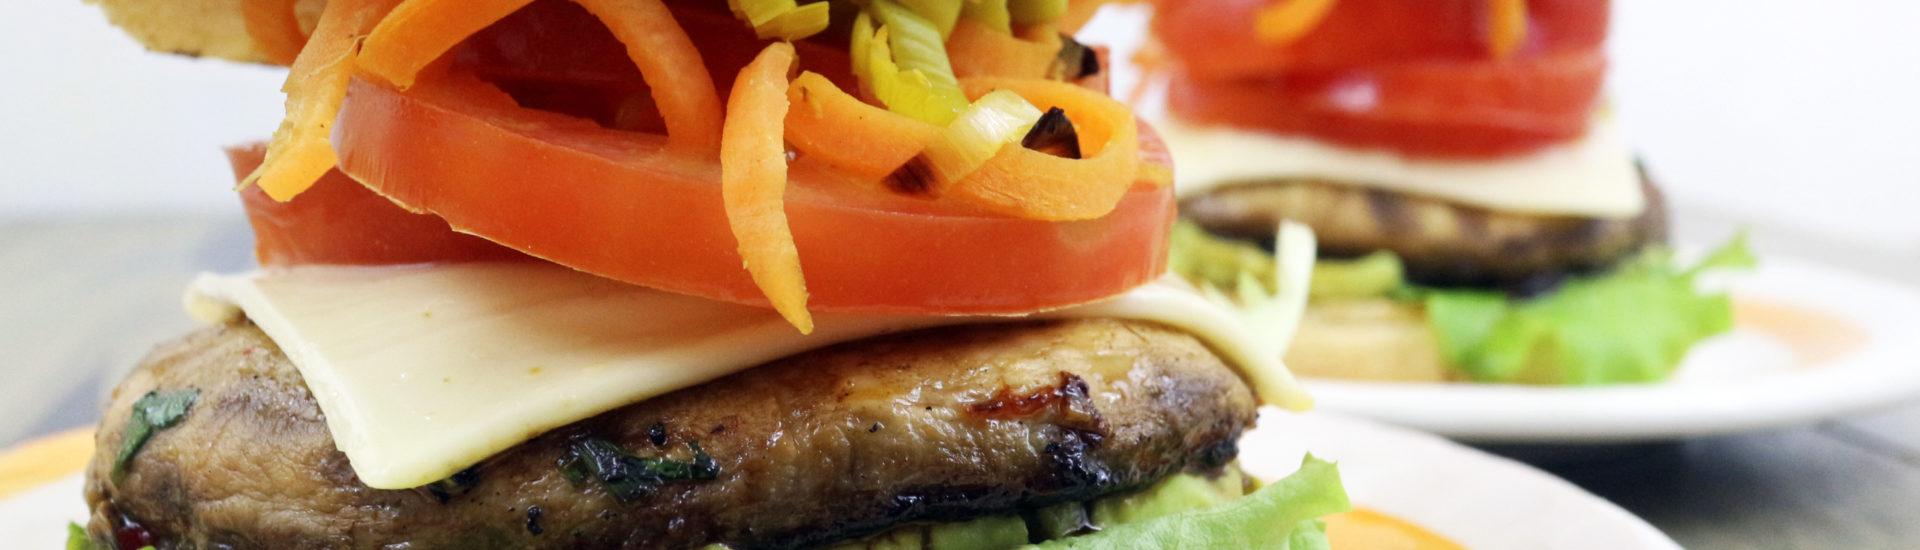 Burger di Portobello vegan